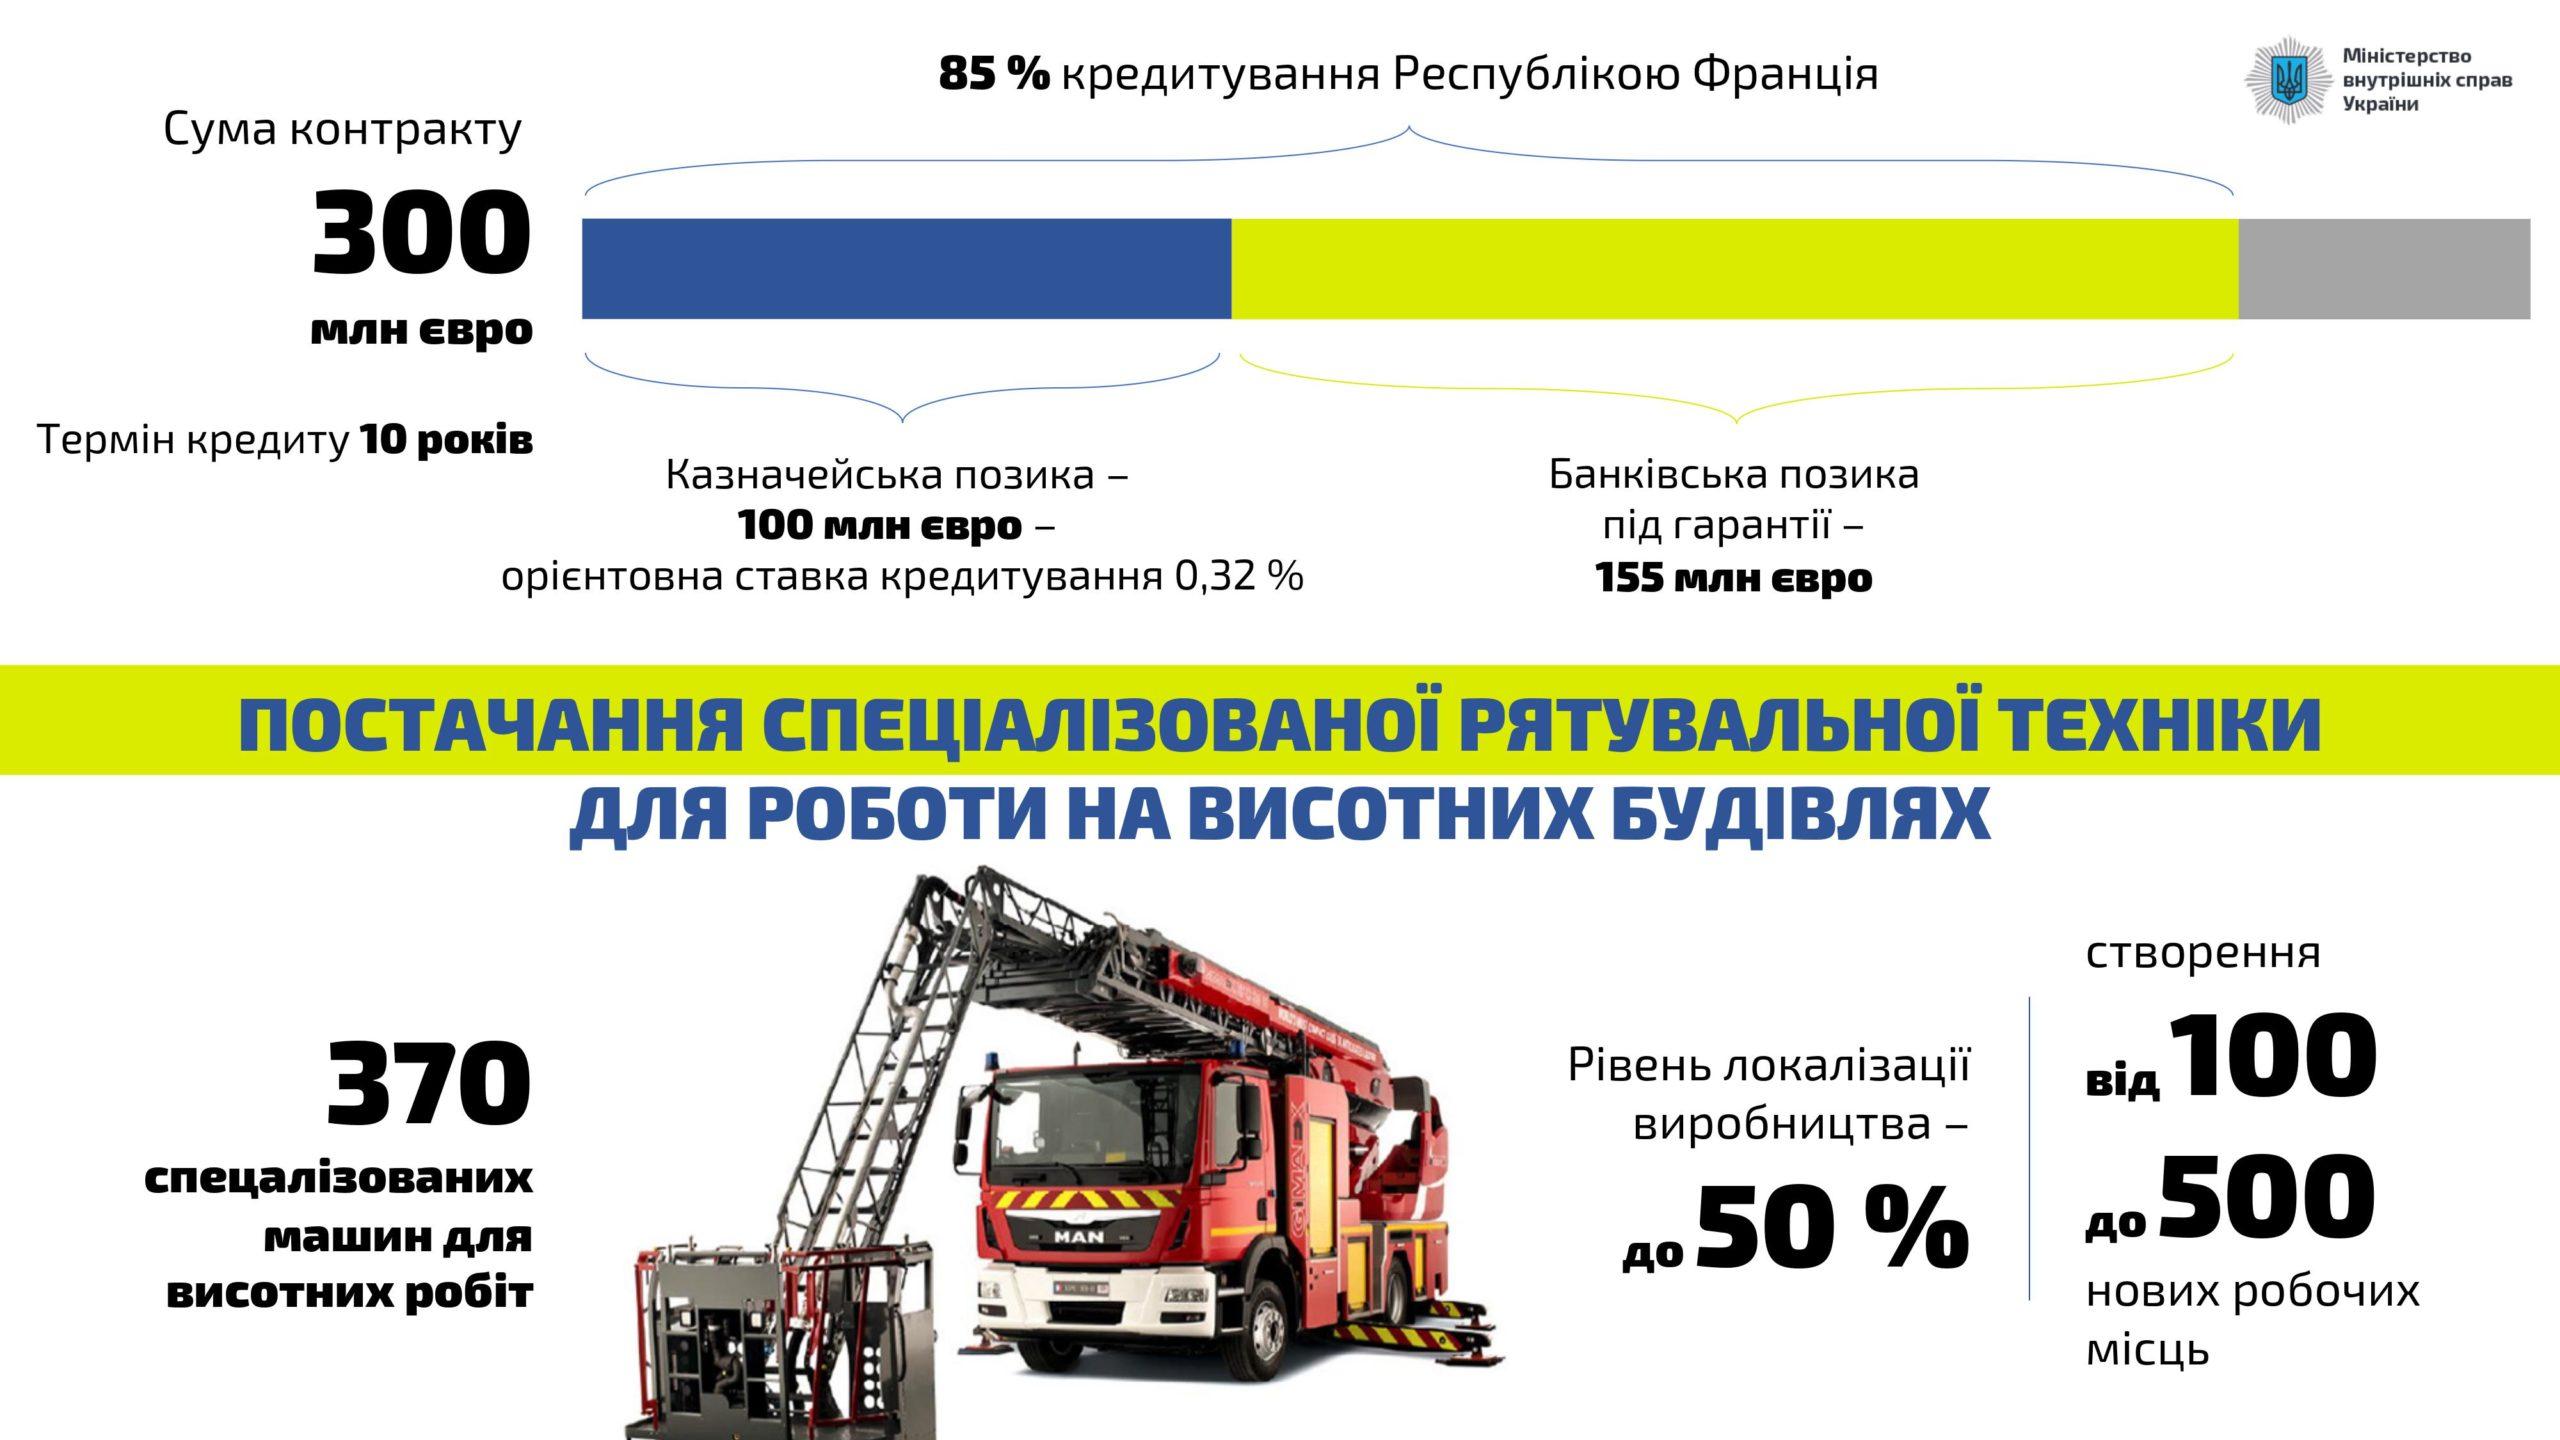 https://mvs.gov.ua/uk/press-center/news/verxovna-rada-ratifikuvala-cotiri-investiciini-ugodi-miz-uryadami-ukrayini-ta-franciyi